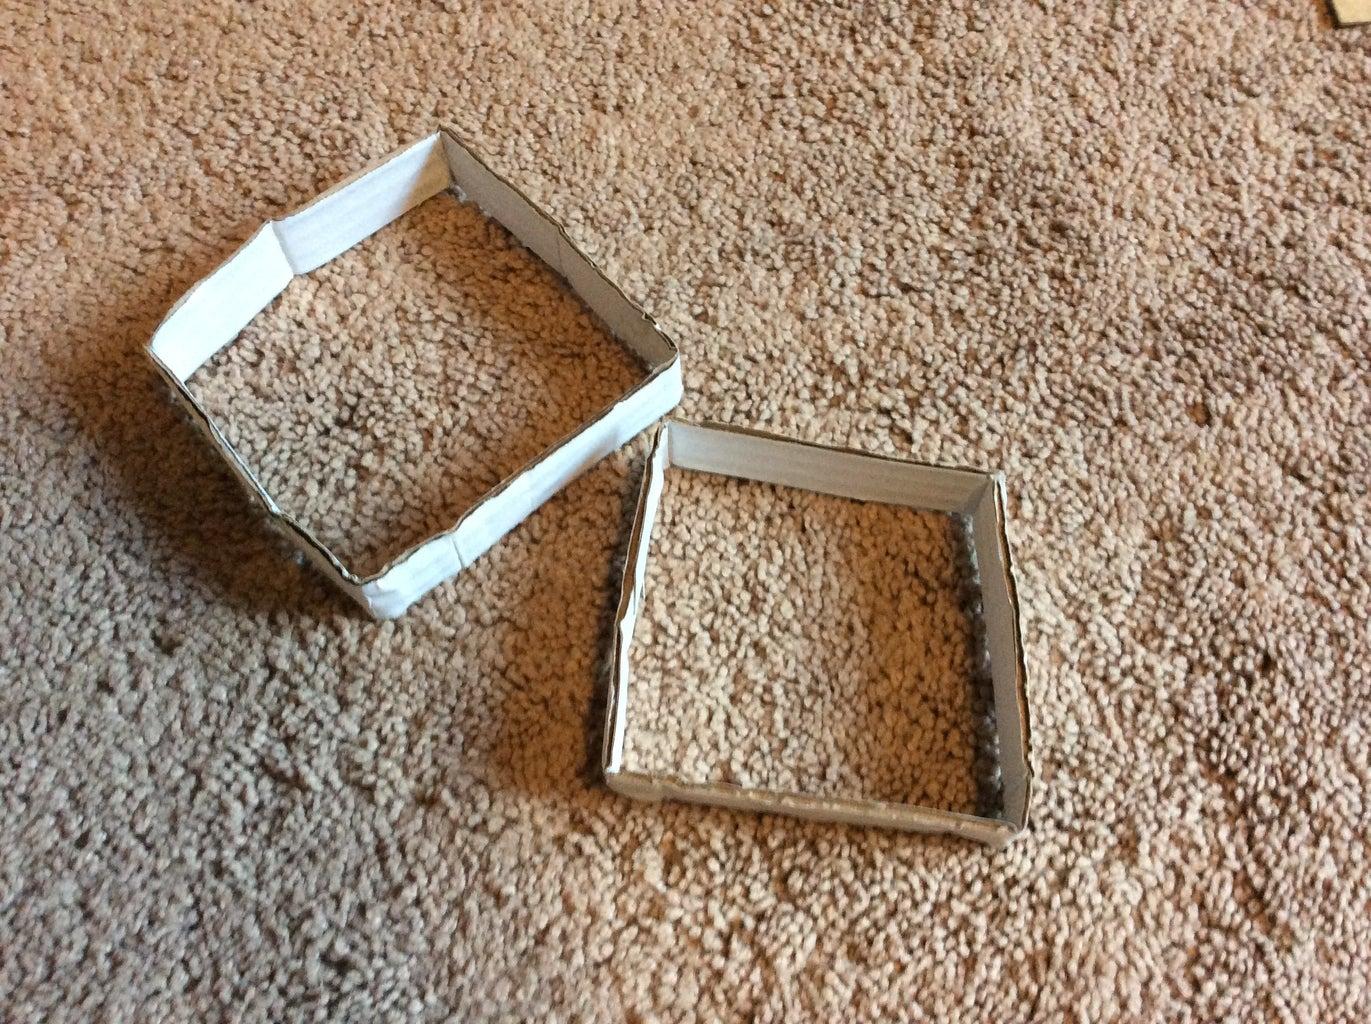 Prepare the Tilting Frames